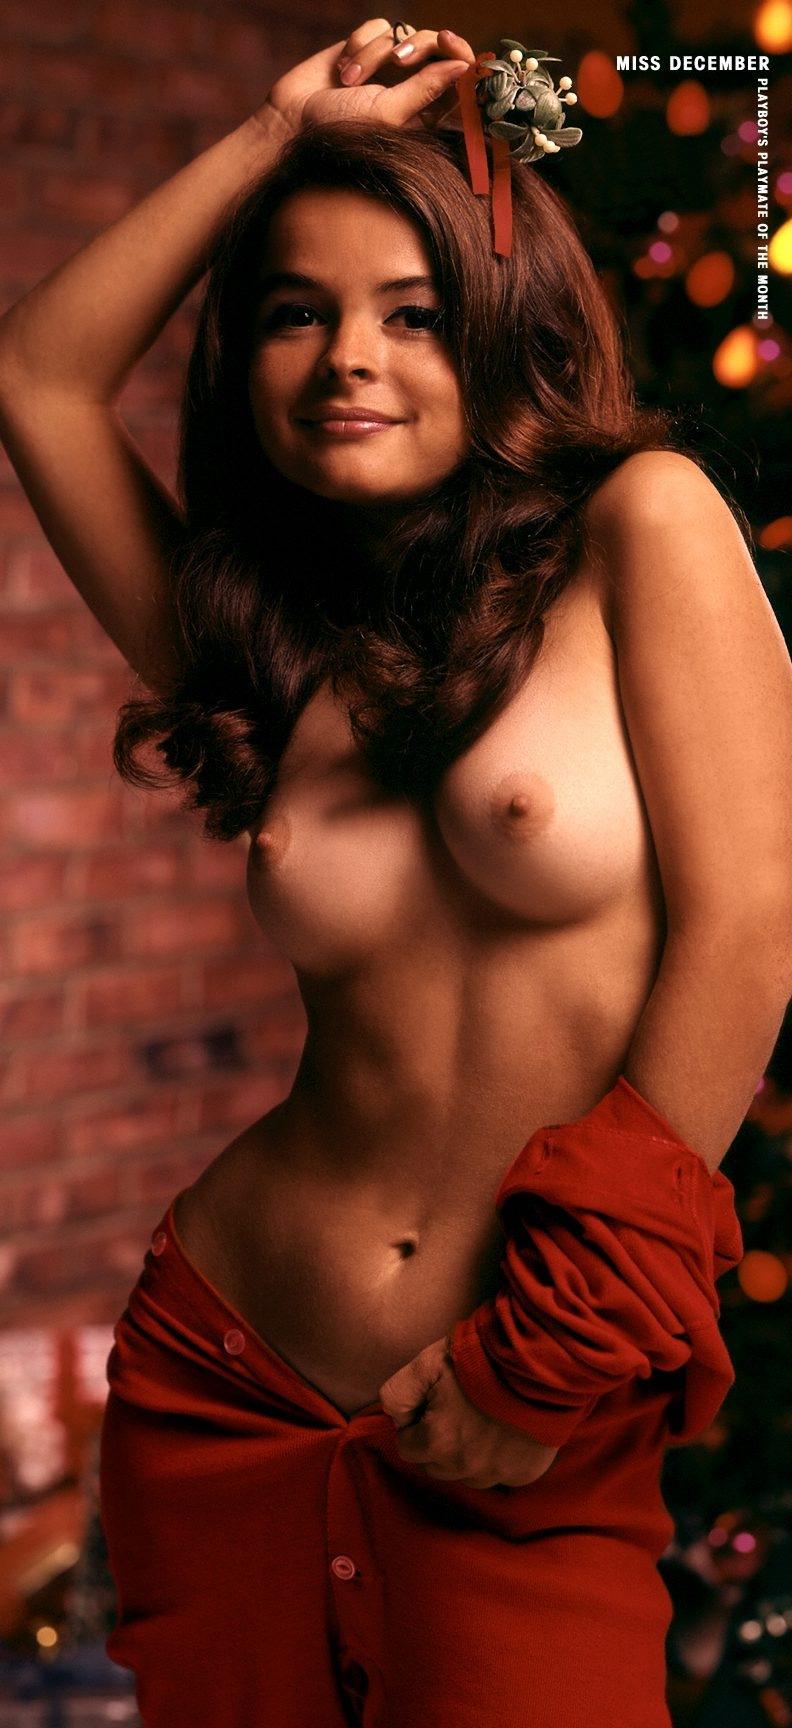 Playboy centerfolds from 1960-1969 | Erotixx